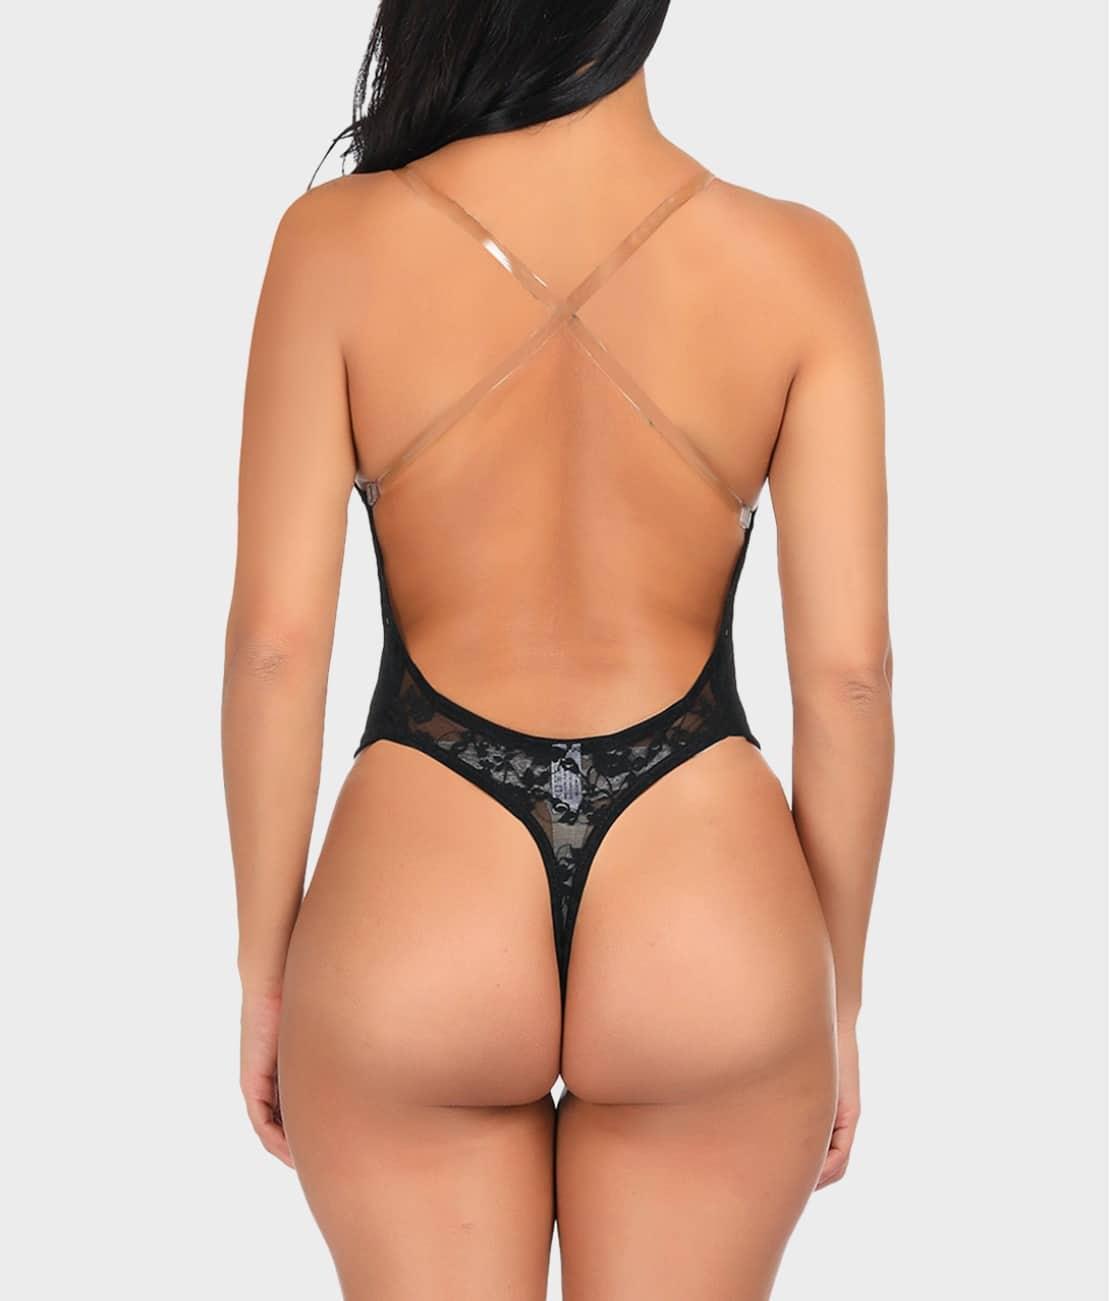 body sculptant string noir